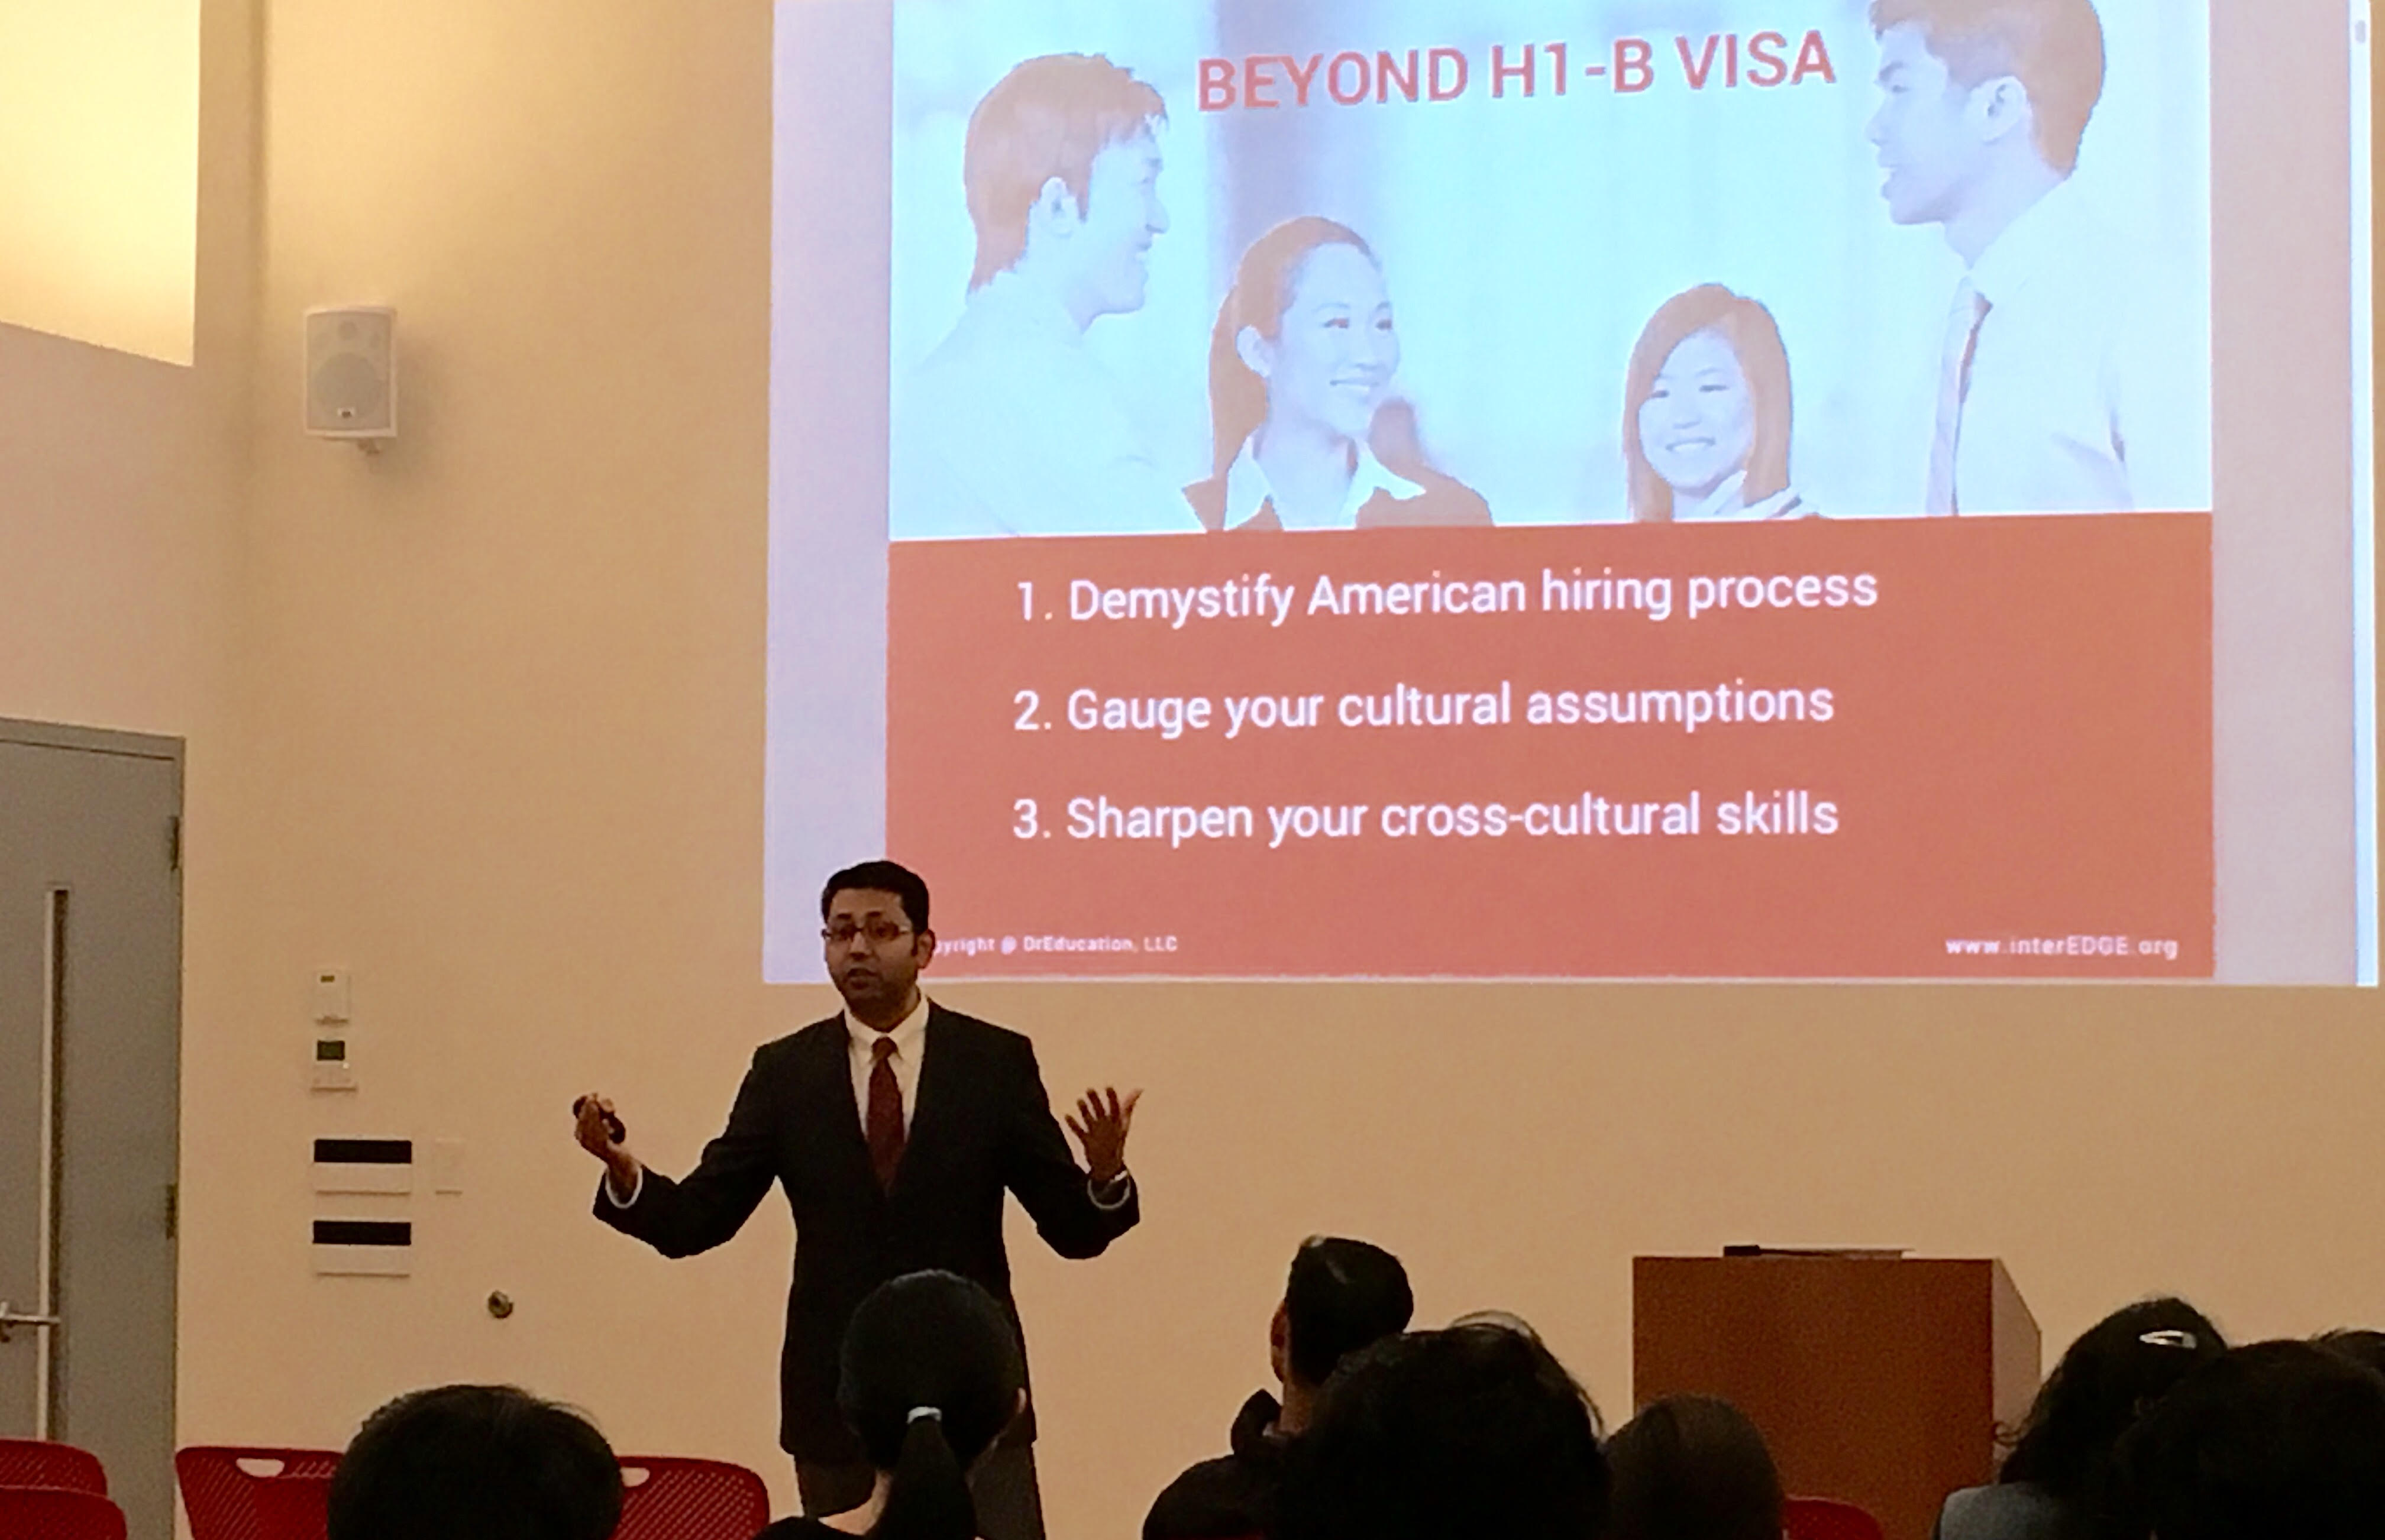 interEDGE Co-founder Dr. Rahul Choudaha Speaks to international students at NYU